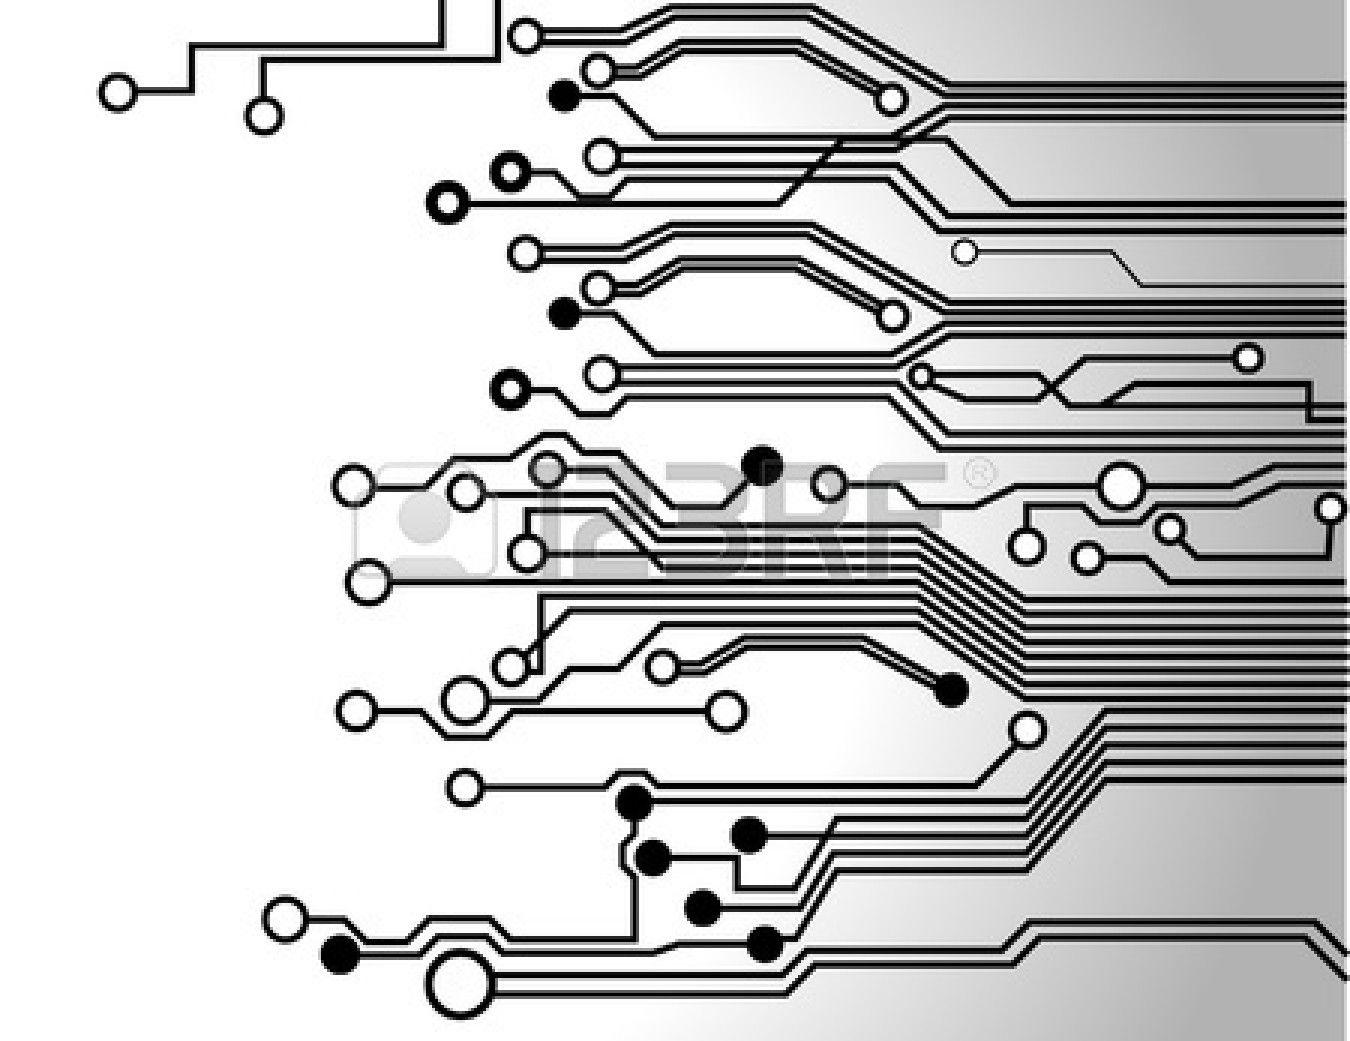 circuit board - Google Search   Body Art Inspirations   Pinterest ...